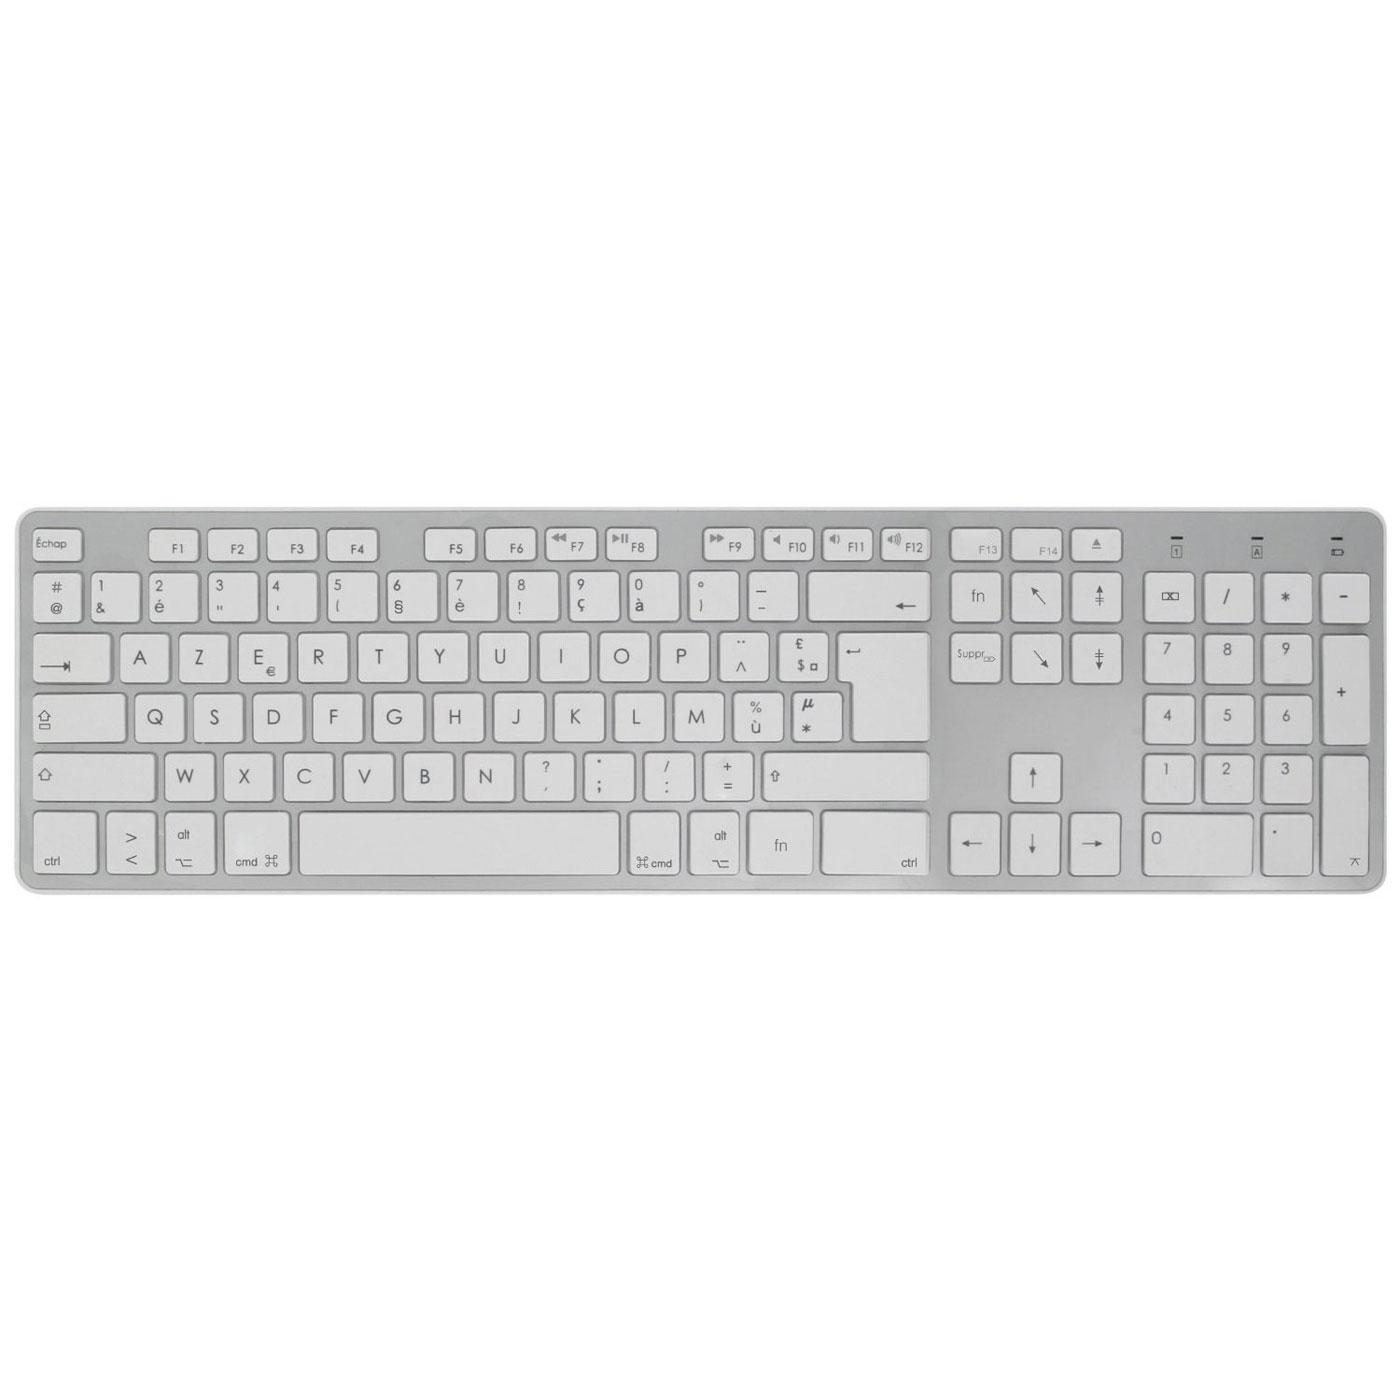 Mobility lab wireless desktop deluxe for mac pack clavier souris mobility lab sur - Prix pack office pour mac ...